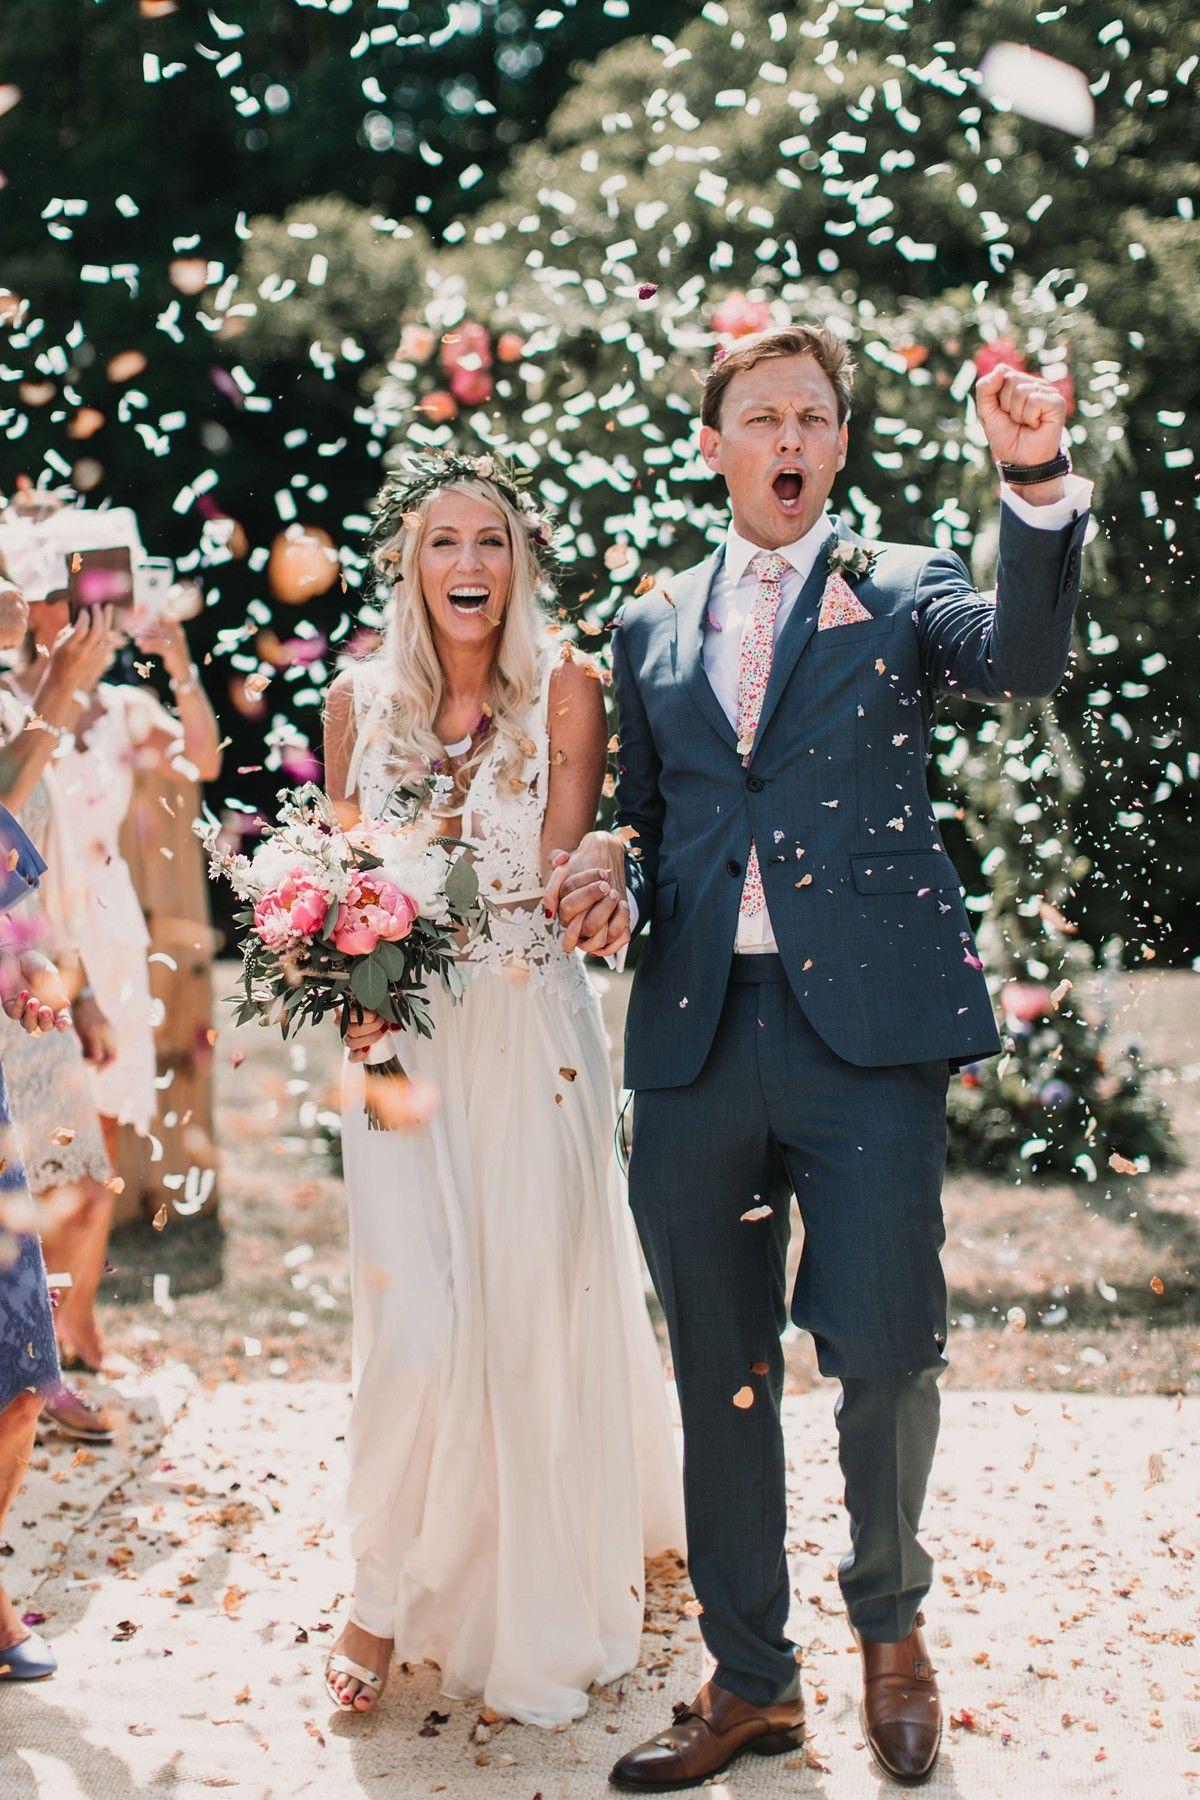 floral Liberty print wedding  ties - real weddings CatkinJane